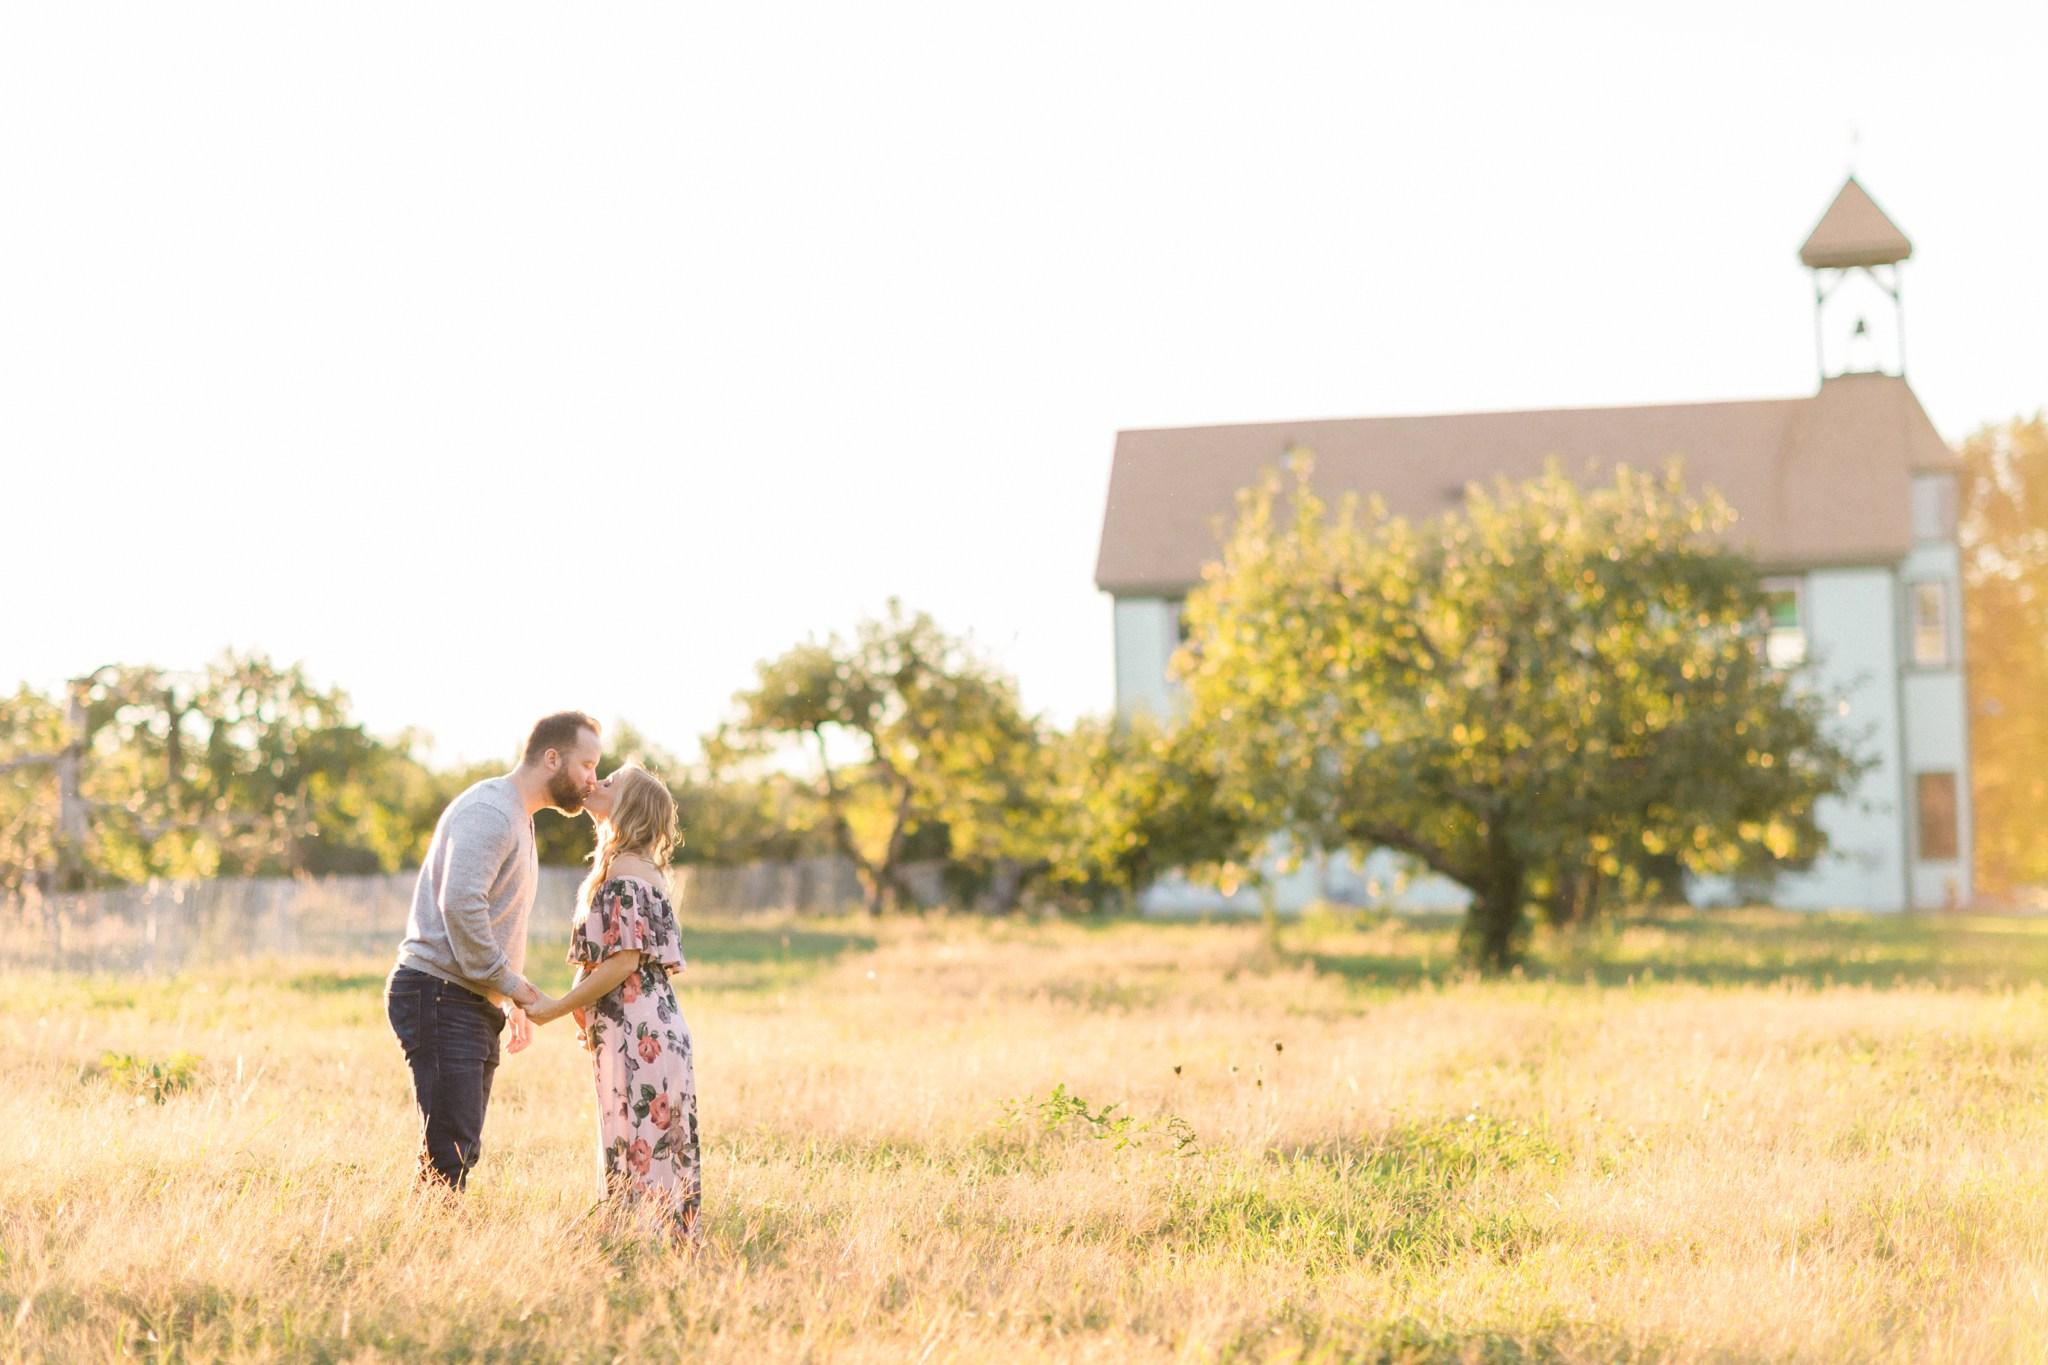 maternity_session_smith_barn_deborah_zoe_photography_00013.JPG